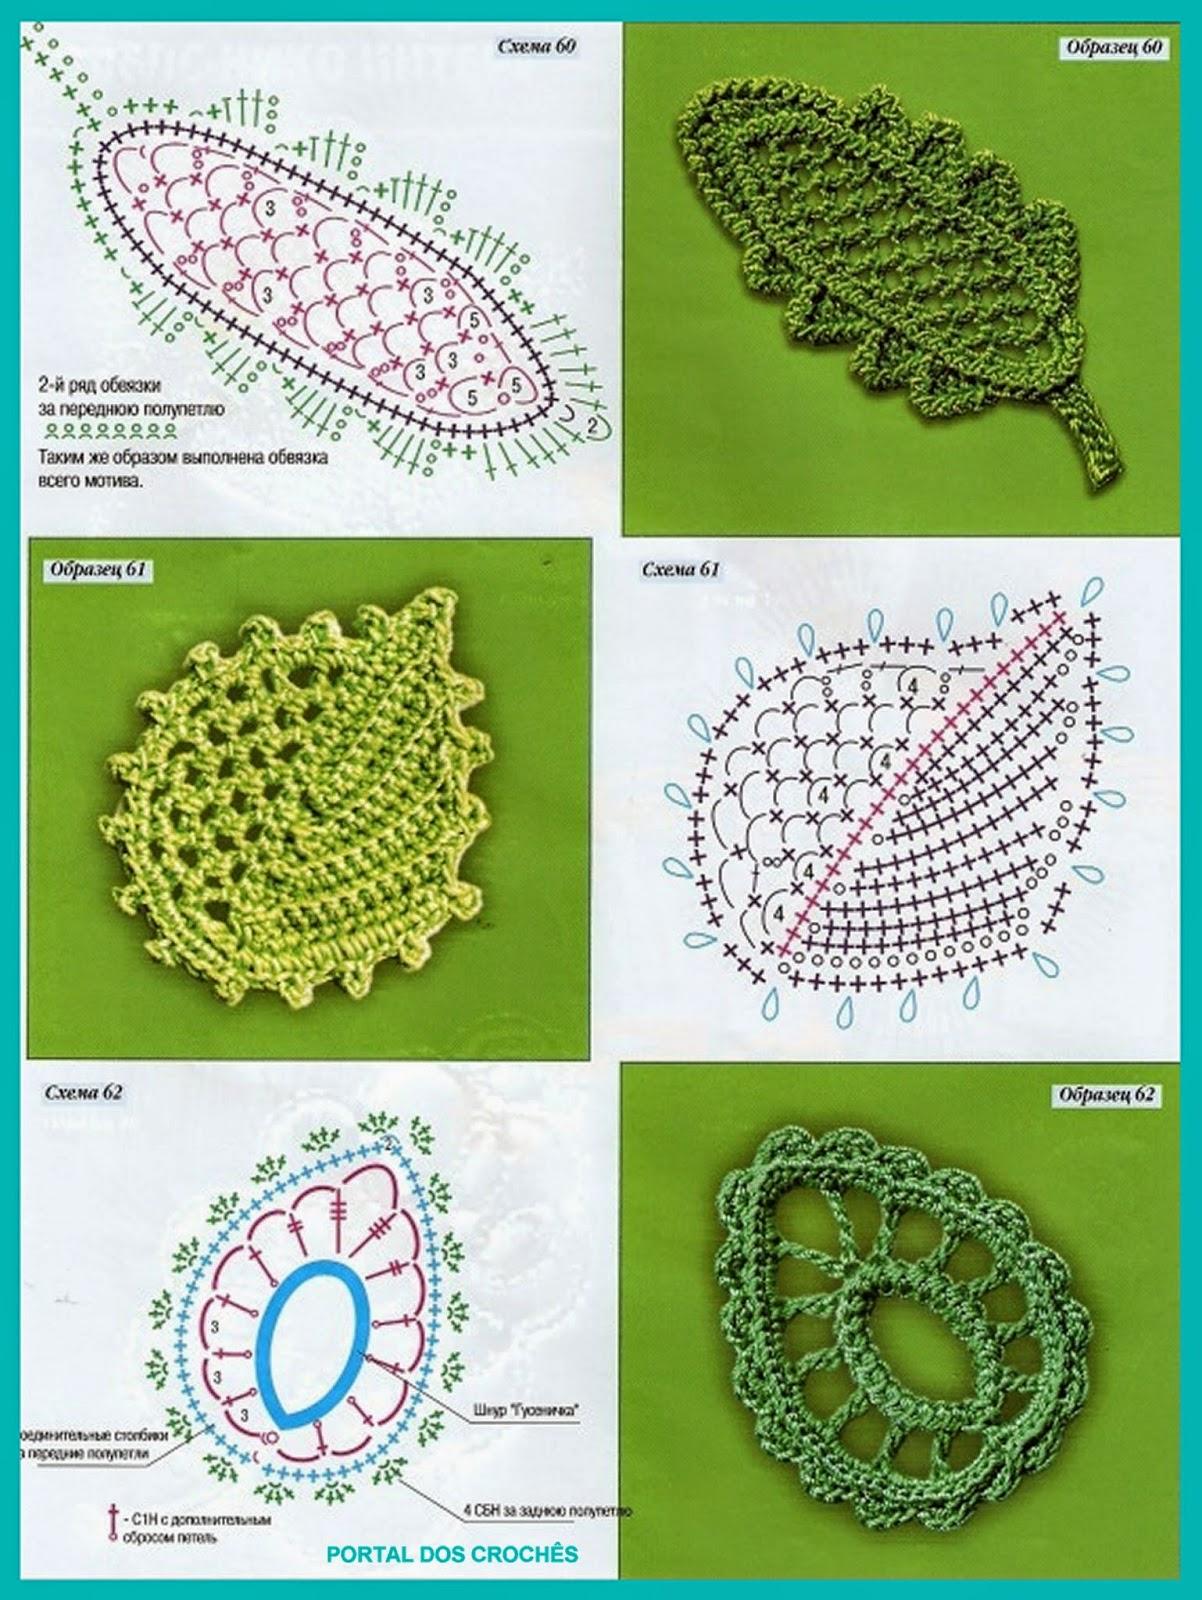 Free Crochet Fern Leaf Pattern : PORTAL DOS CROCH?S: FLORES E FOLHAS DE CROCH? PARA APLICAc?ES